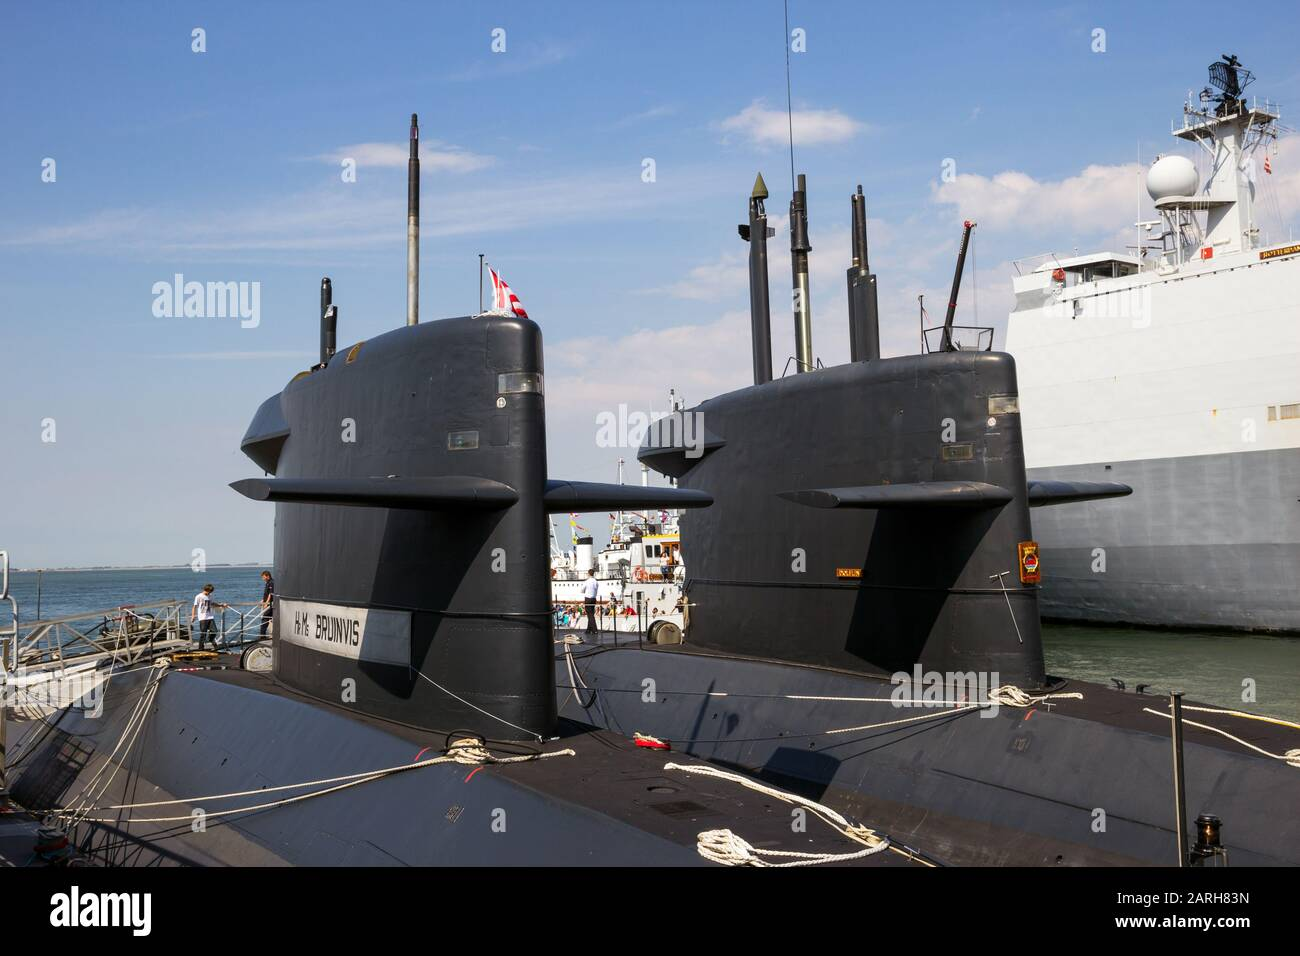 Den Helder The Netherlands Jul 7 2012 Dutch Navy Walrus Class Submarine Moored During The Dutch Navy Days Stock Photo Alamy